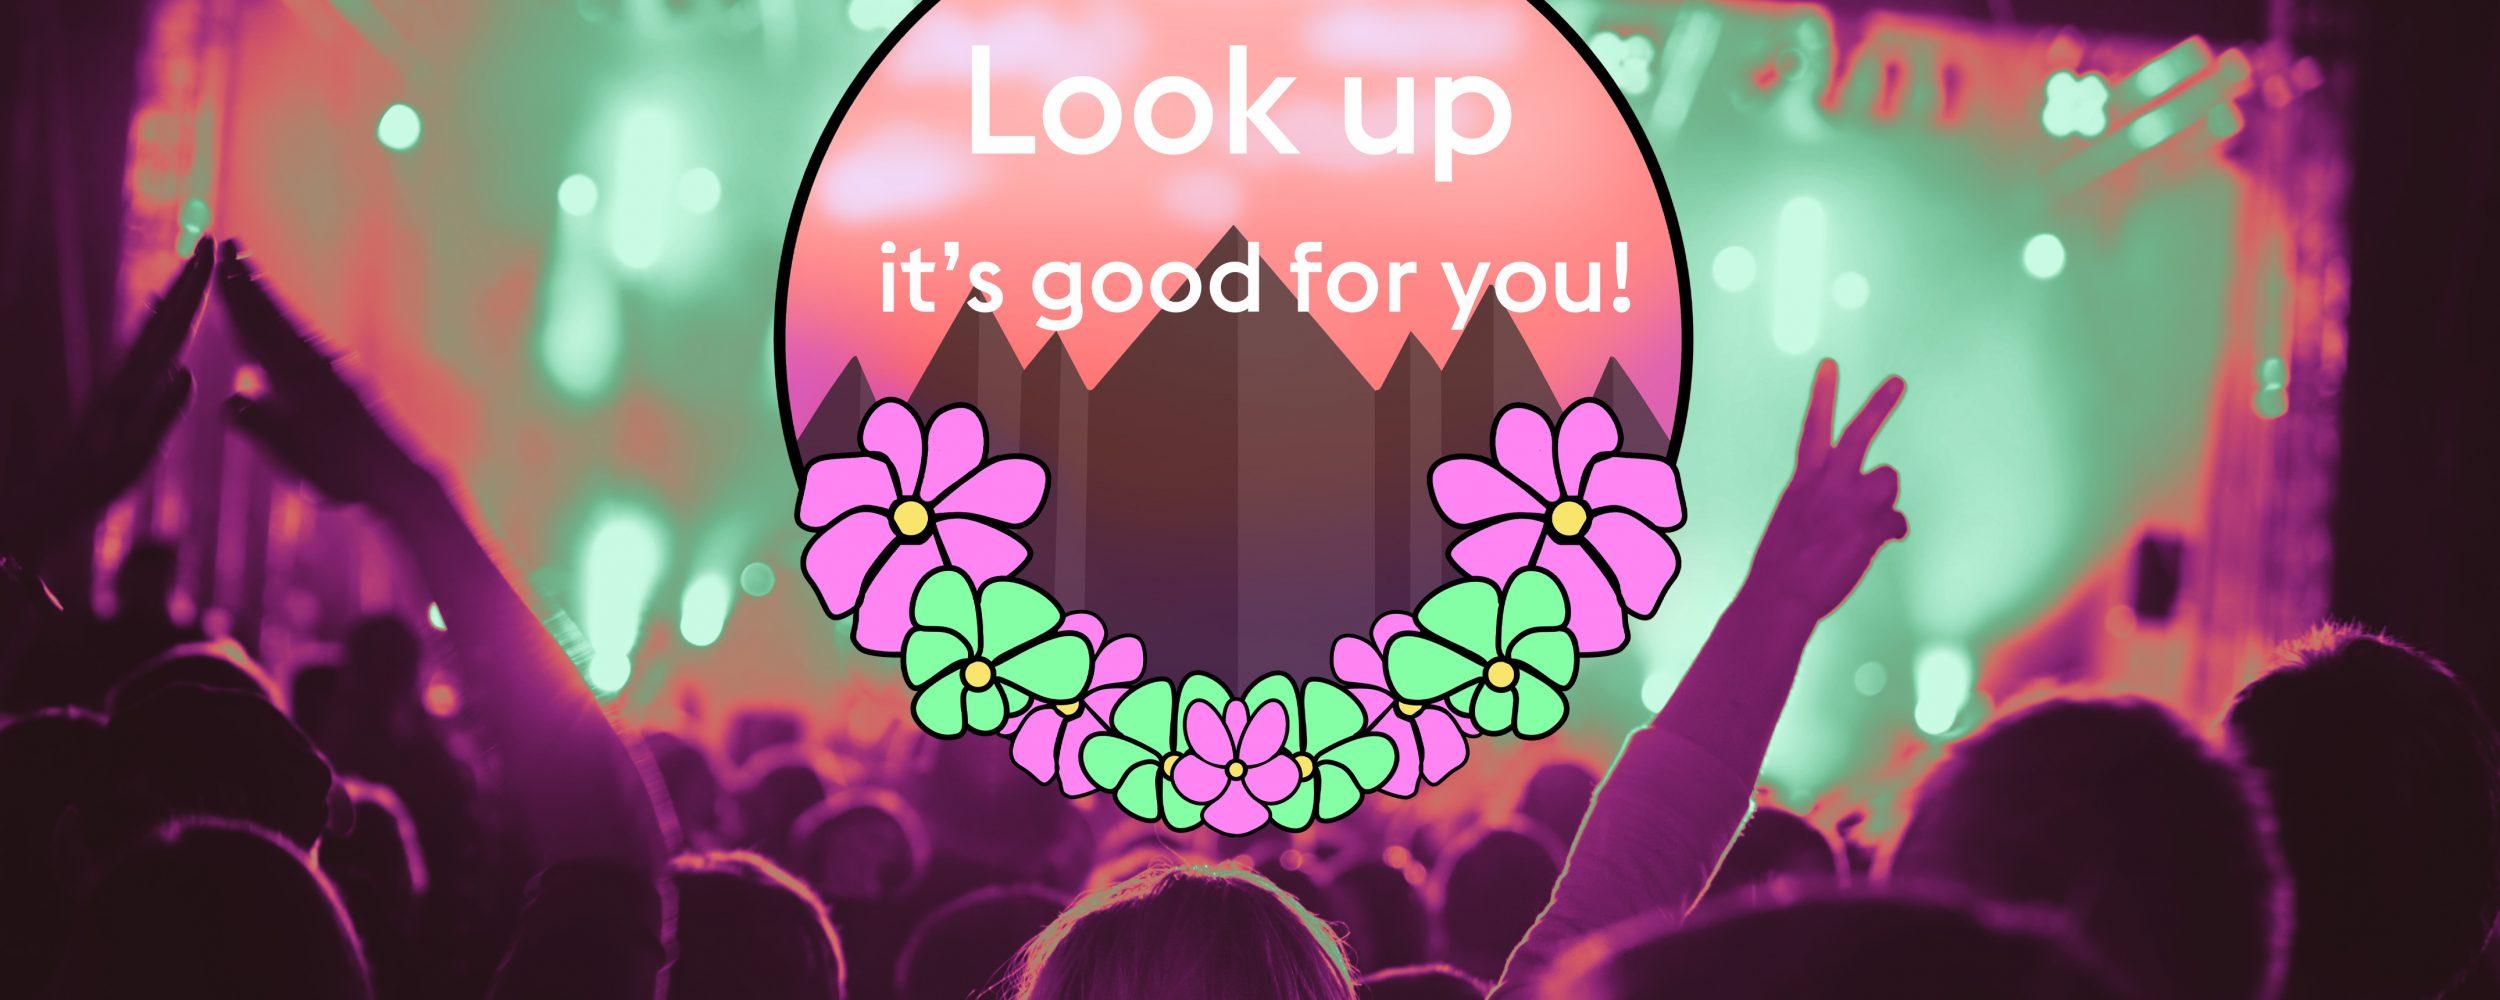 Gratiskonsert: Look up its good for you